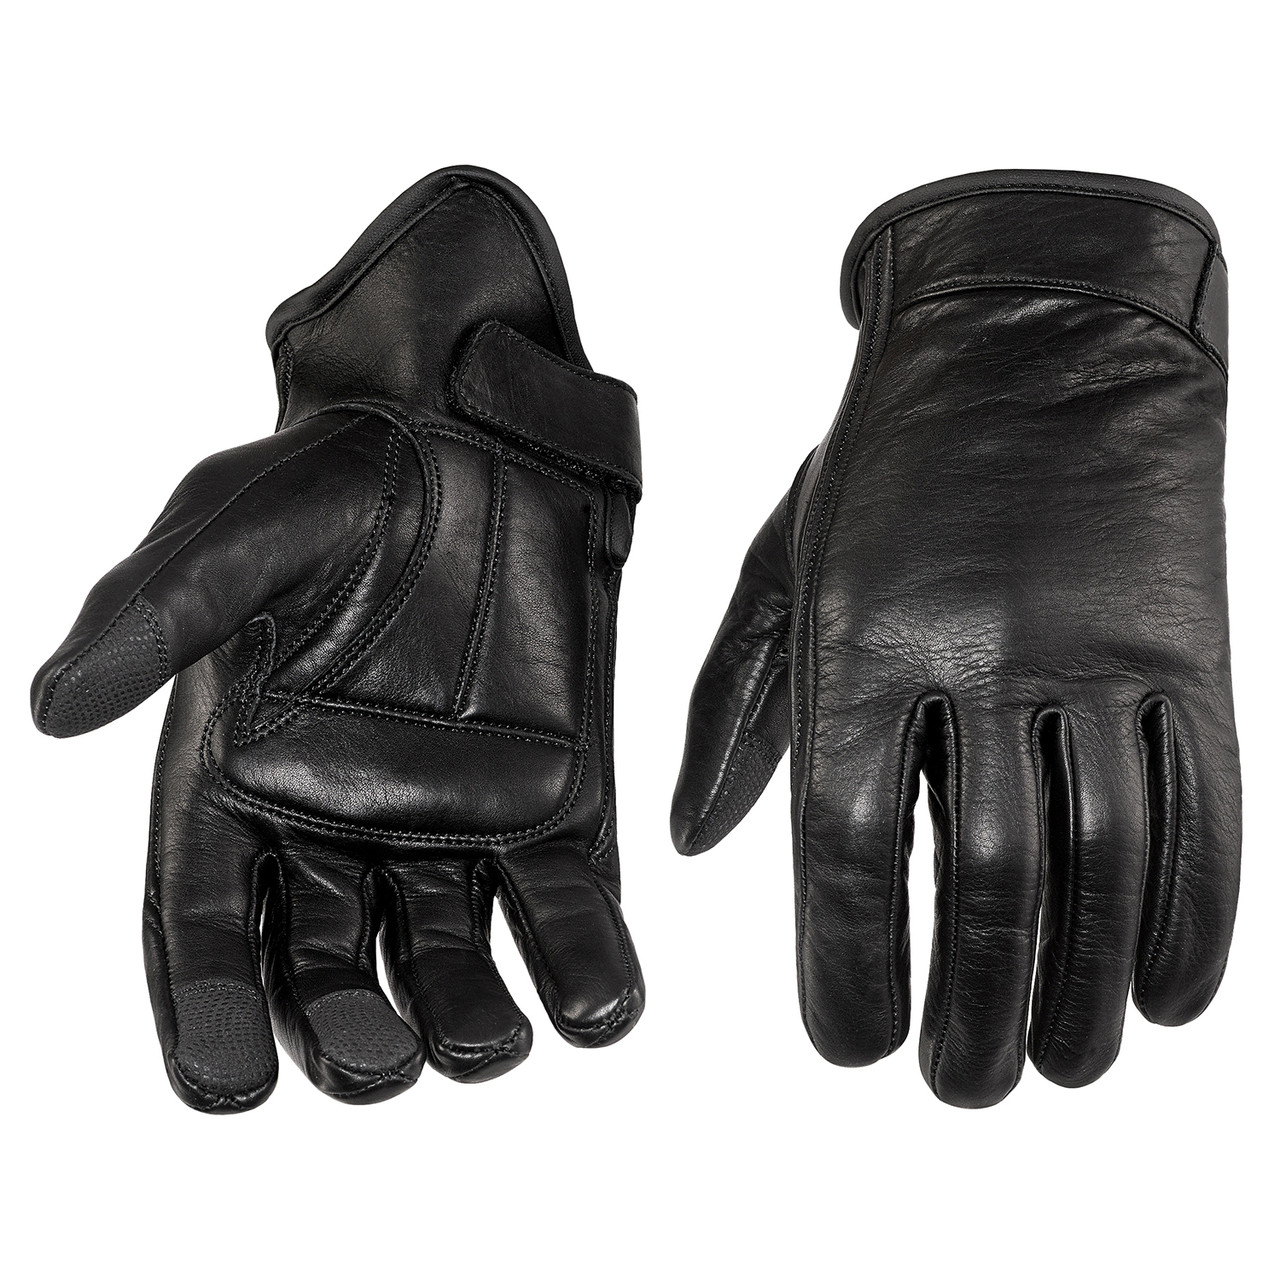 Men/'s Premium Leather Motorcycle Cruiser Touring Biker Gel Gloves